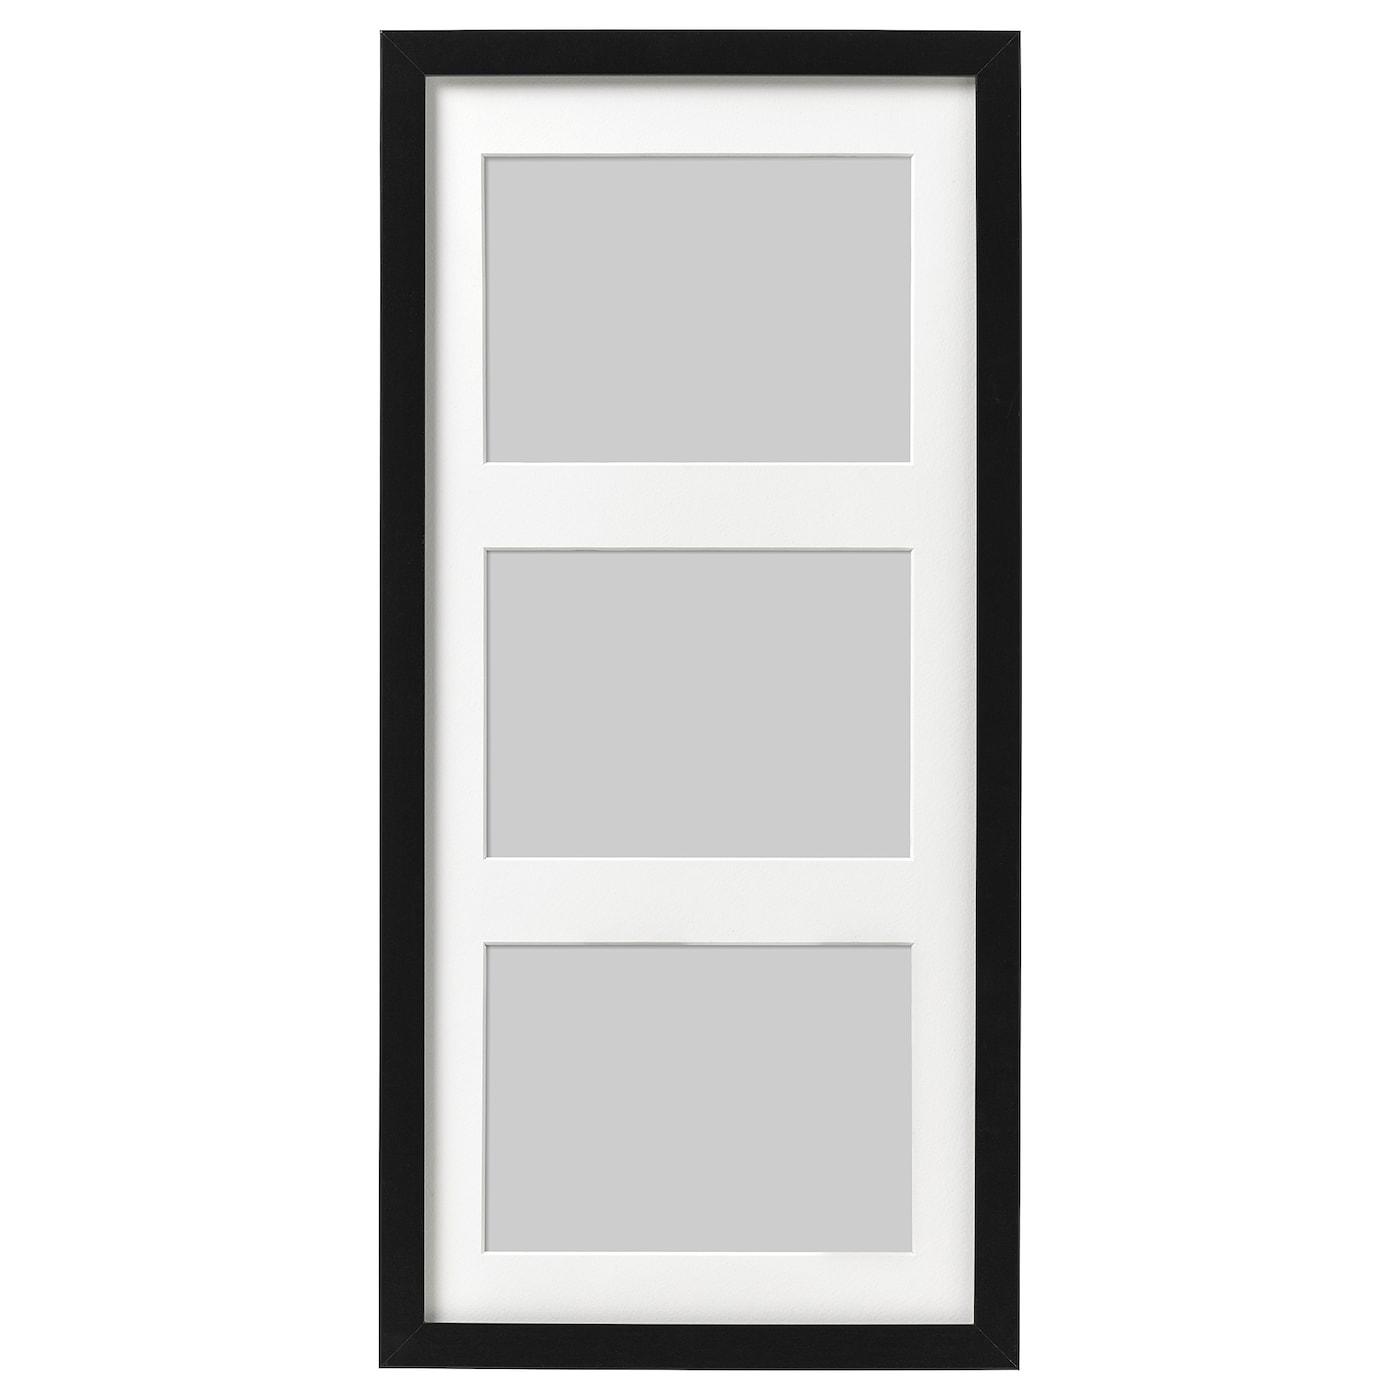 RIBBA Frame Black 50 x 23 cm - IKEA